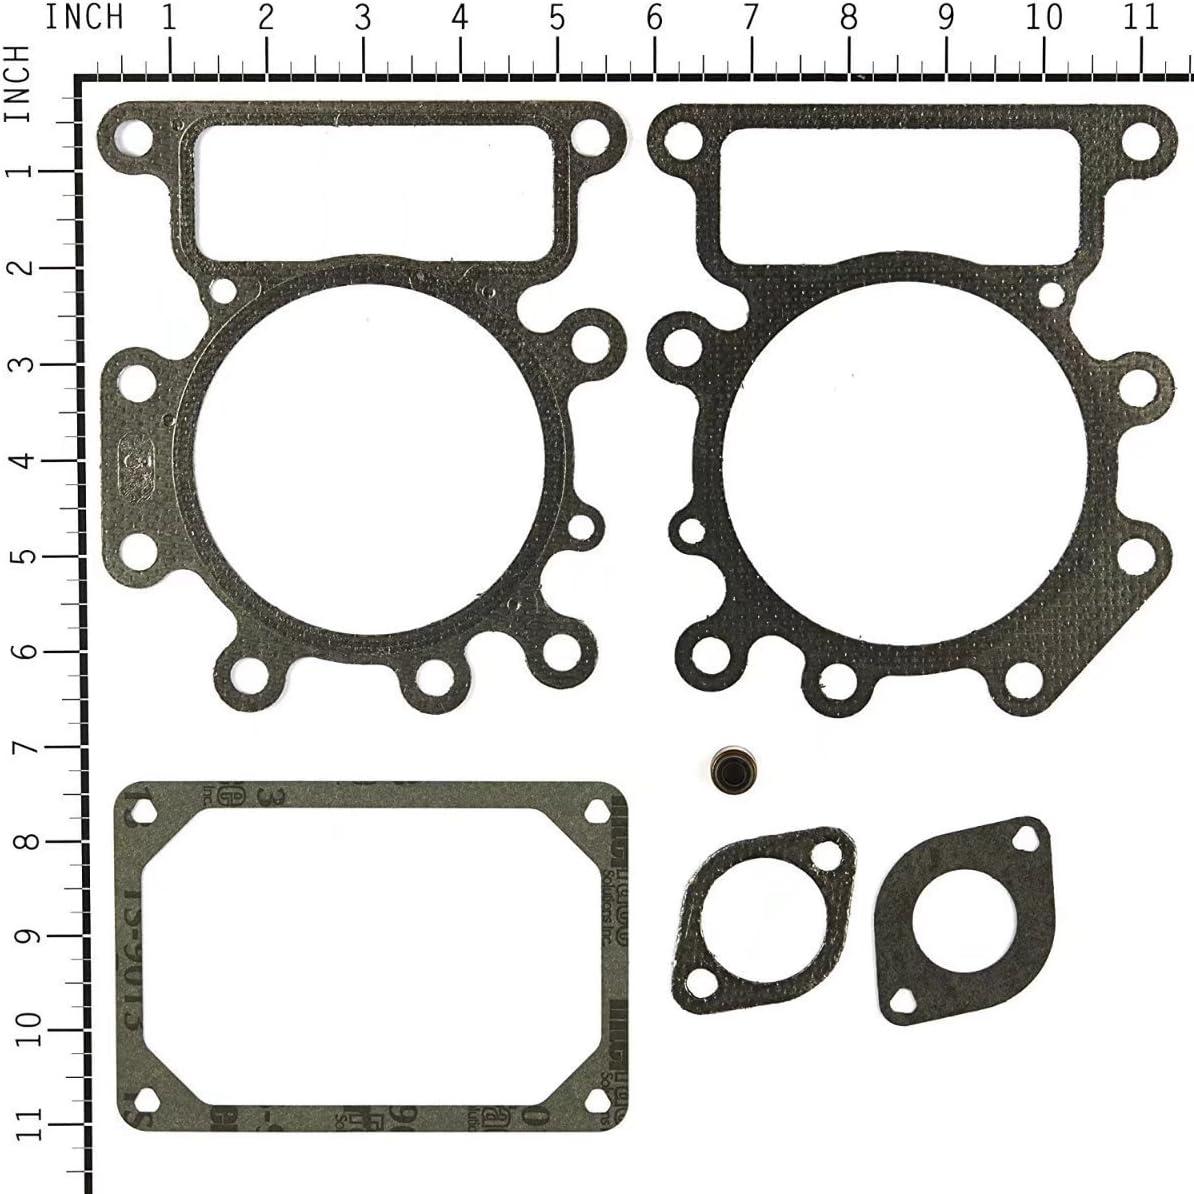 Aikai New Valve Gasket Set for Briggs & Stratton 794152 Replaces # 690190